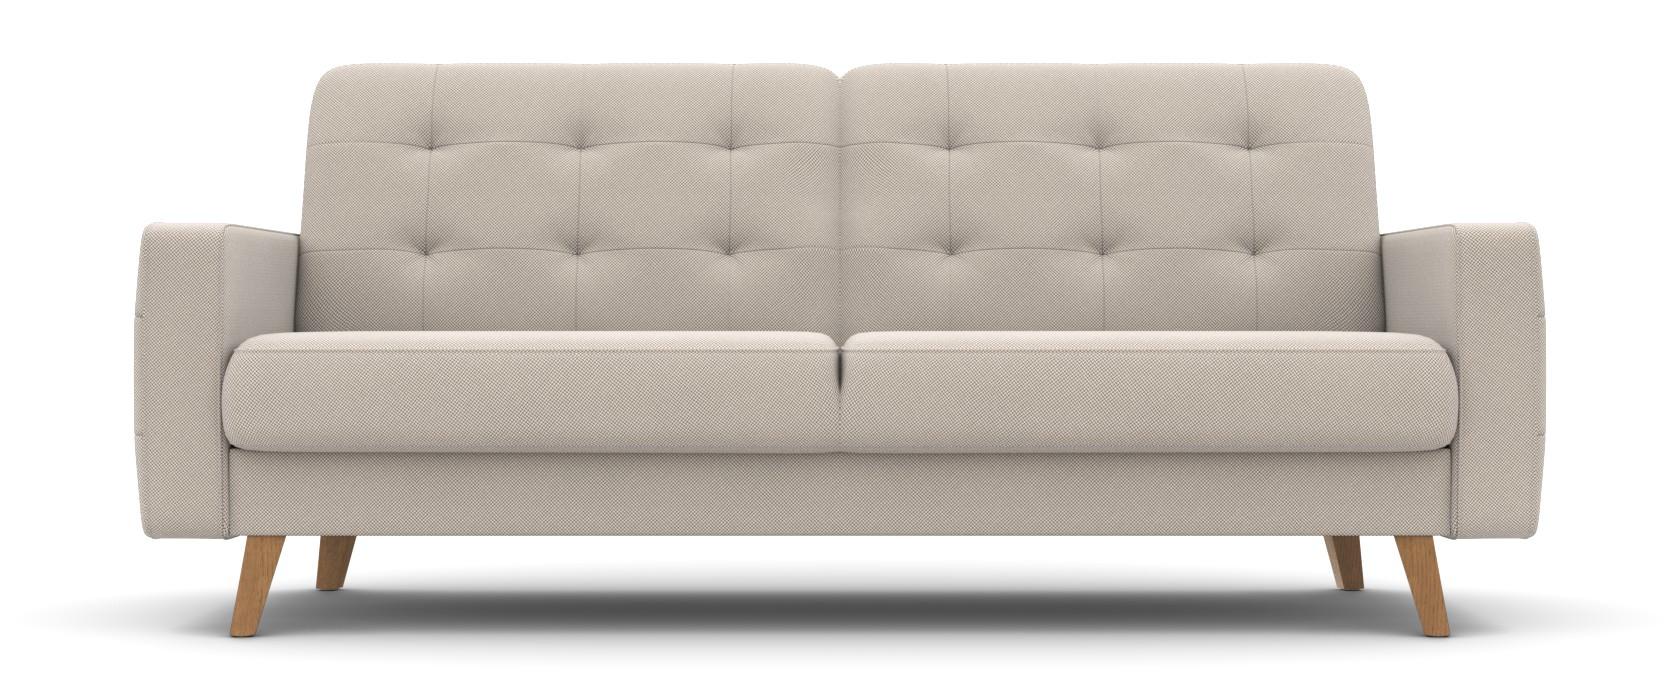 Трехместный диван Savoia - Pufetto